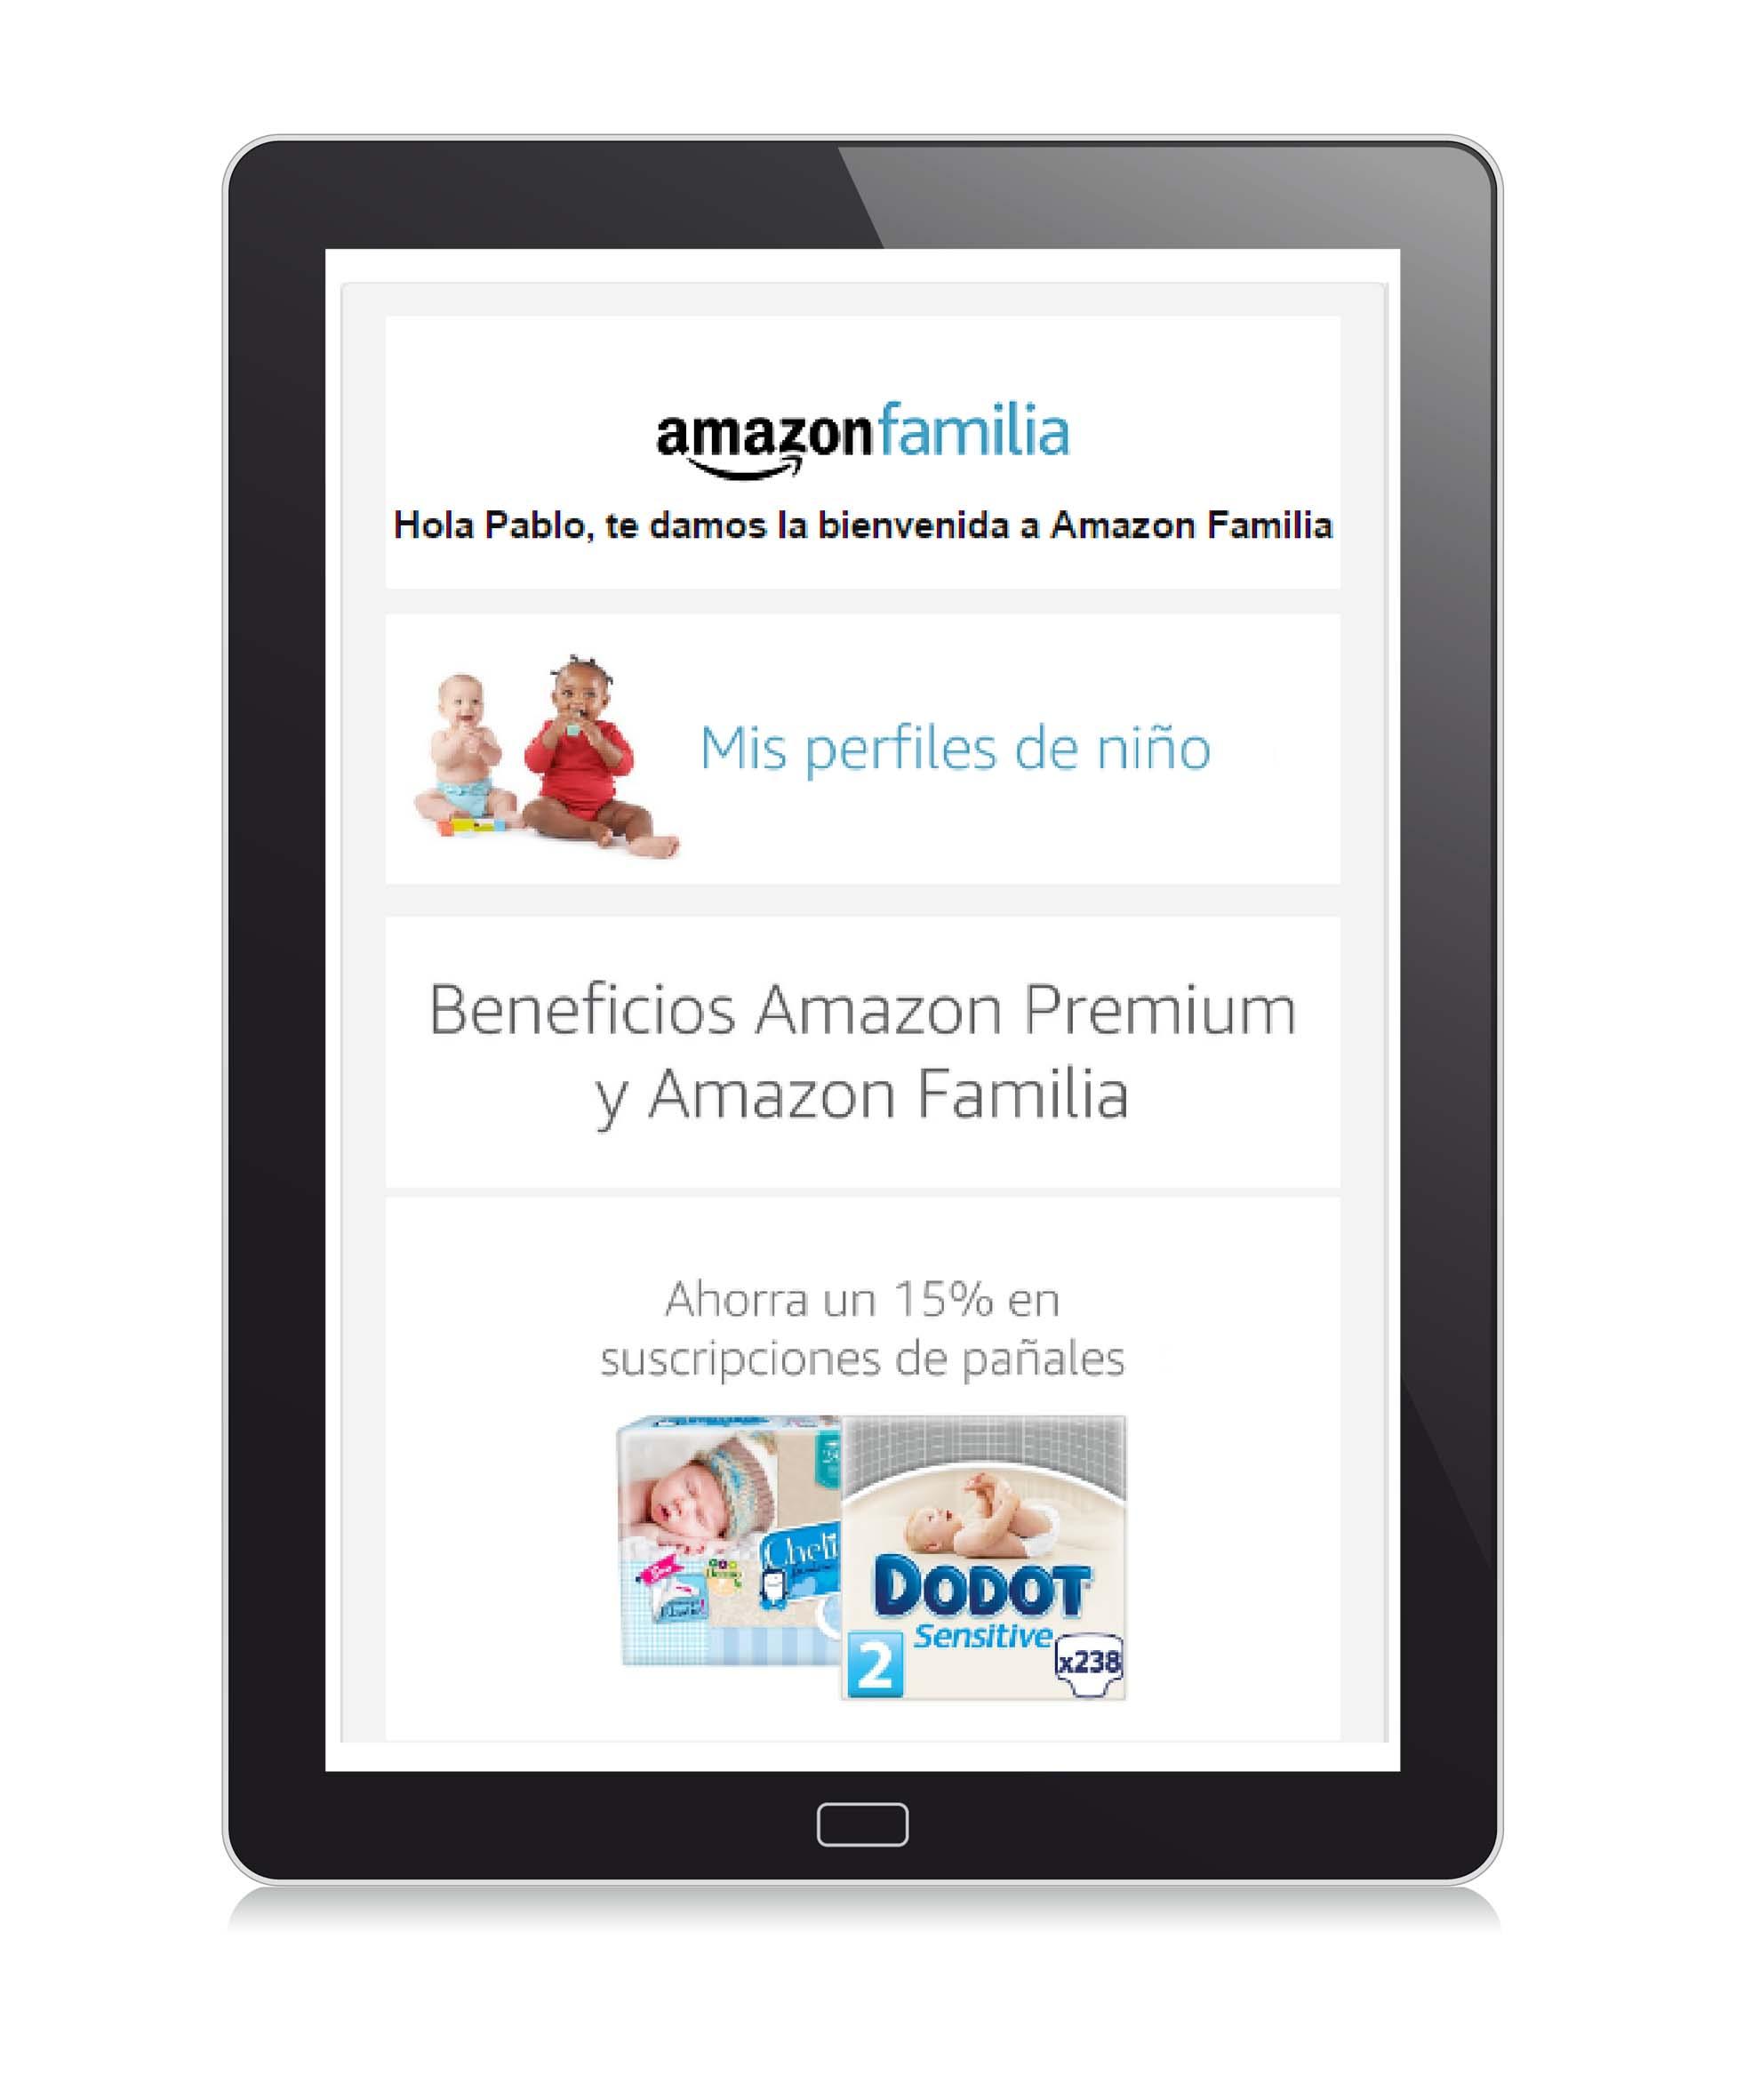 Amazon Familia